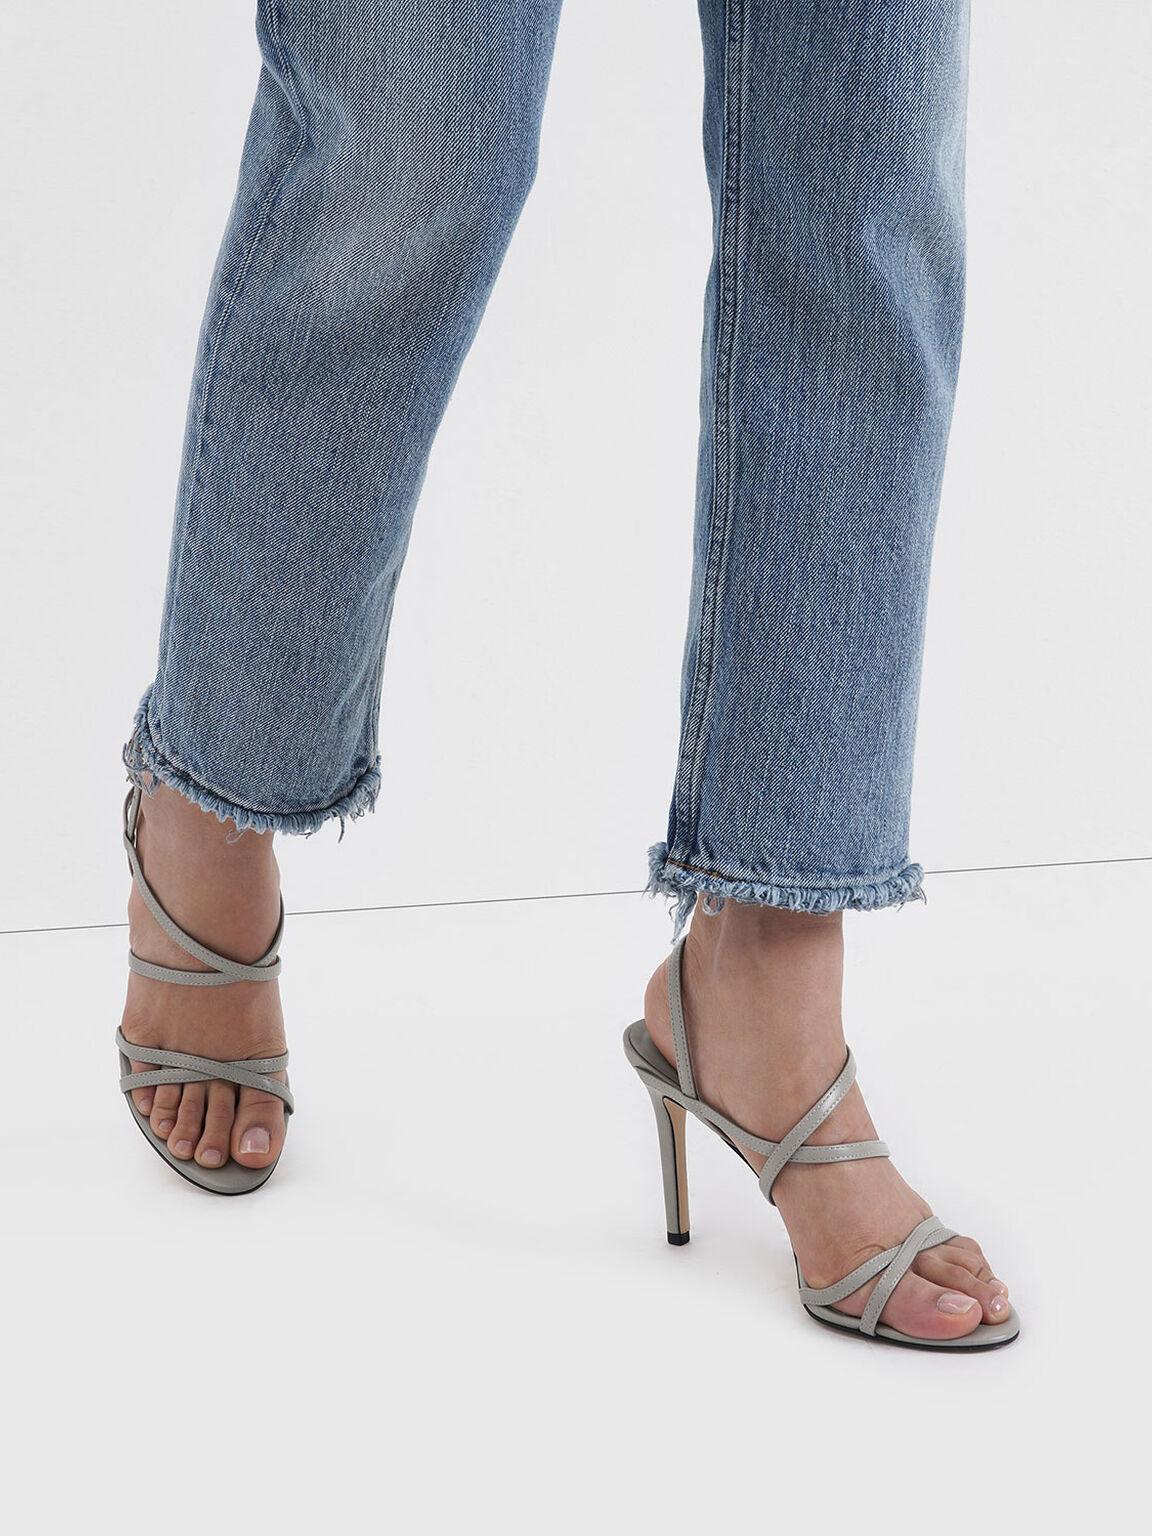 Criss Cross Strappy Stiletto Heels, Light Grey, hi-res